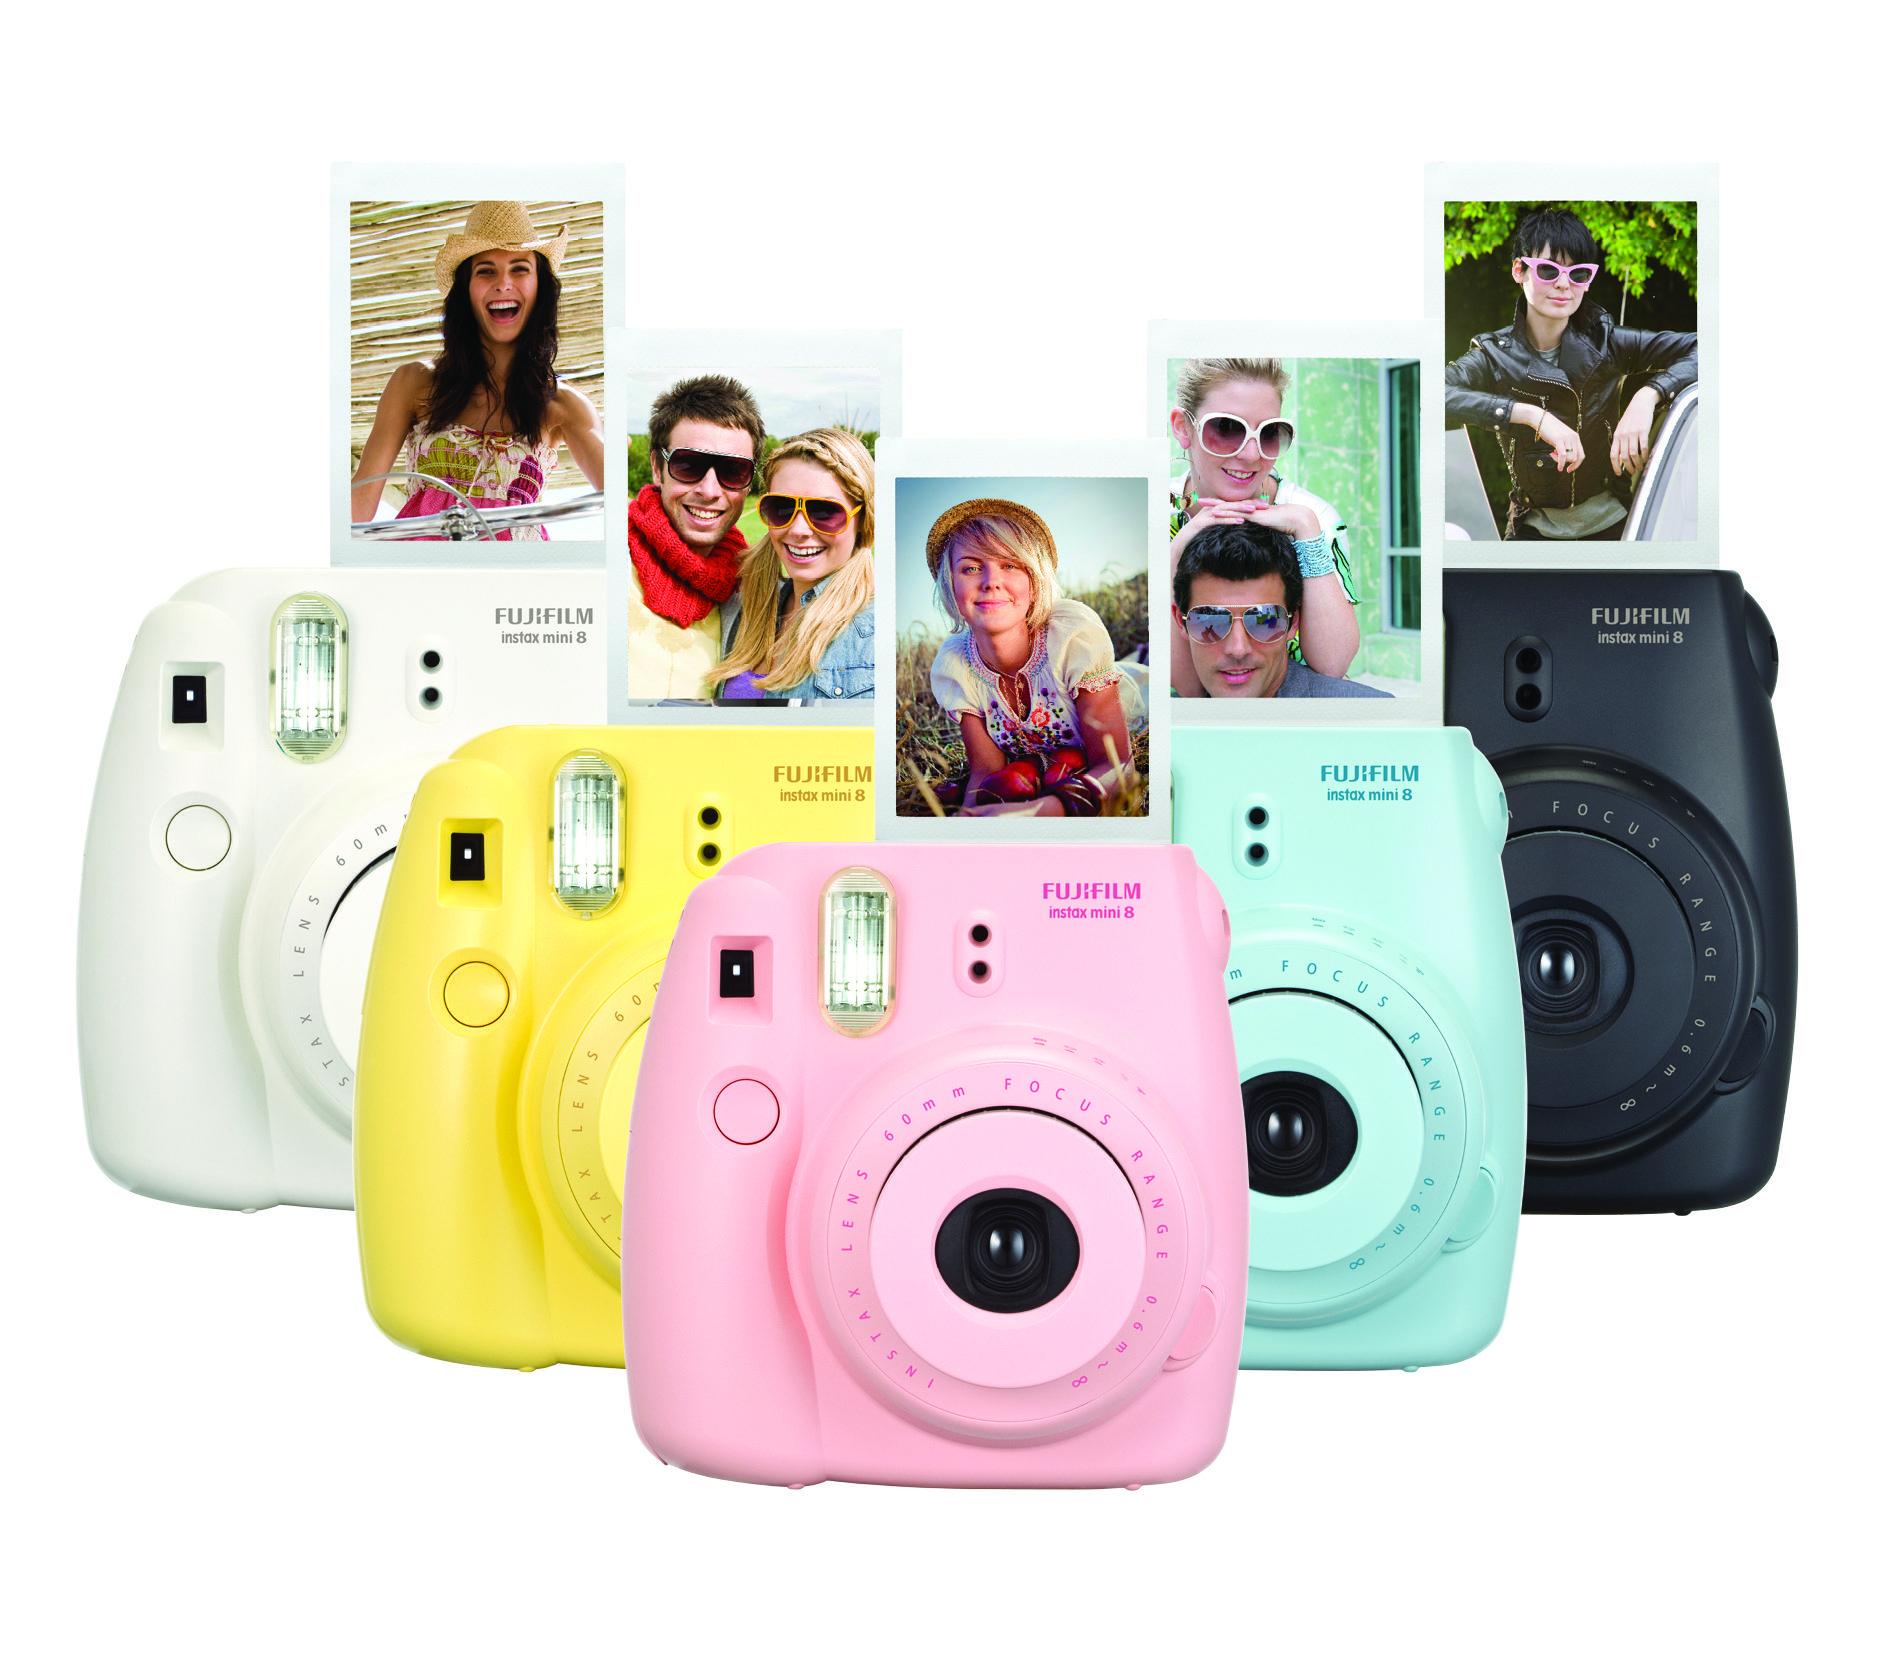 Fujifilm instax mini 8 instant film camera circle lenses polaroid from eyecandy s